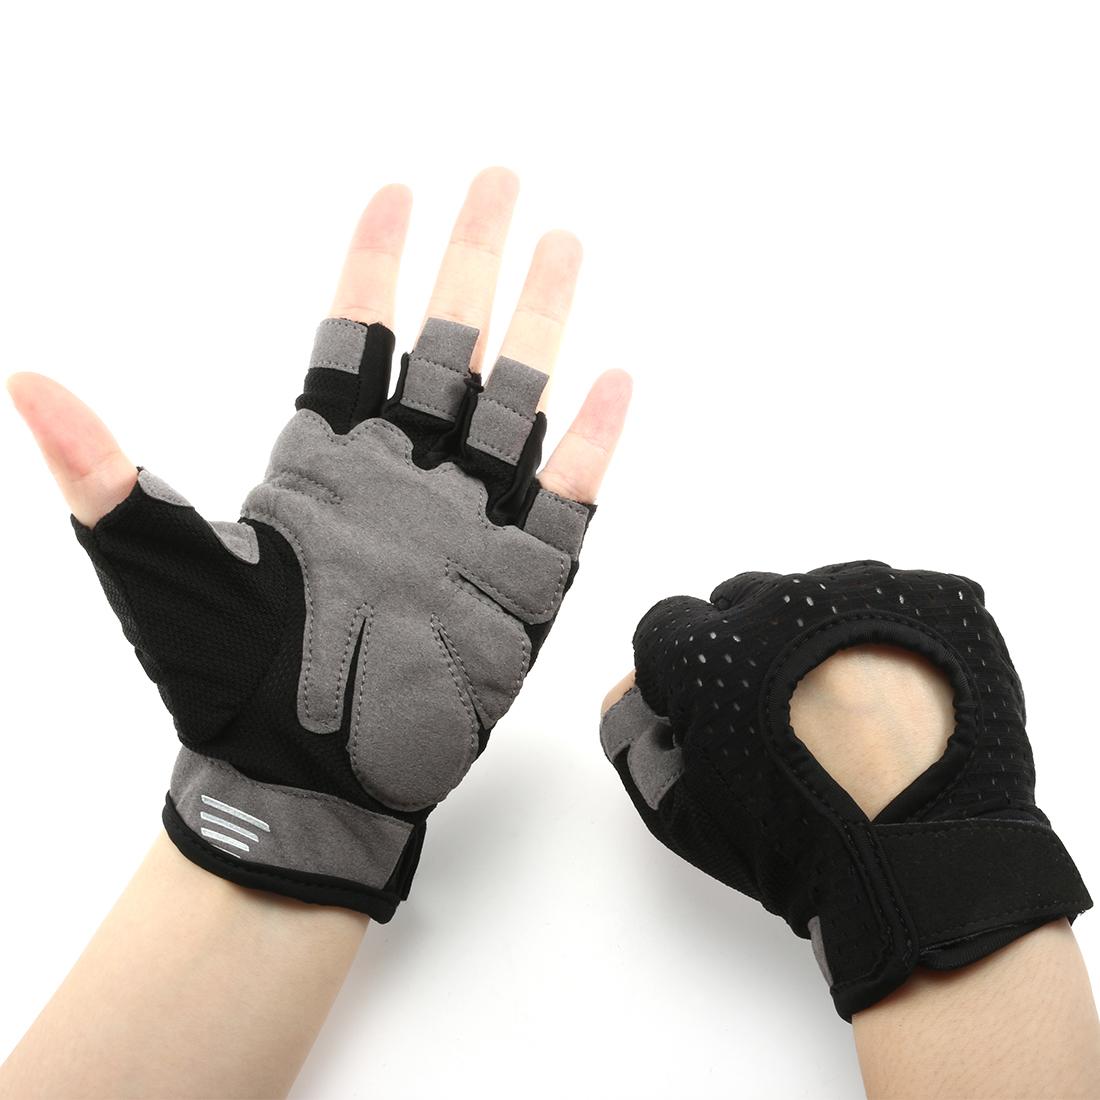 Summer Elasticized Fabric Anti-slip Sports Exercise Half Finger Cycling Gloves Black M Pair